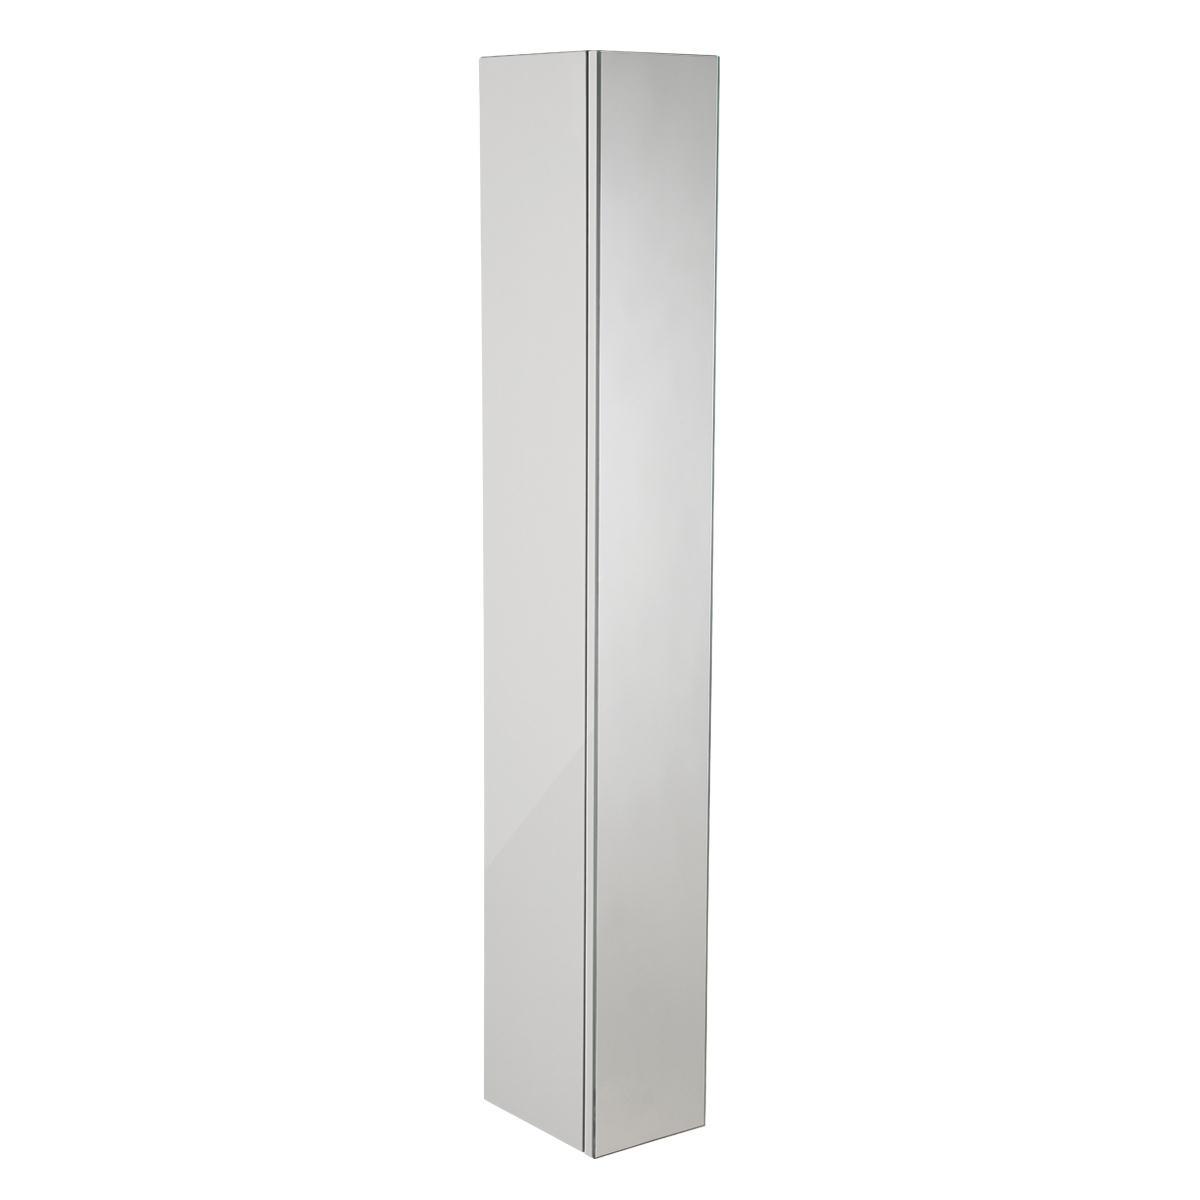 Roper rhodes scheme 1400 x 250mm tall cabinet schcd1400 gw for Bathroom cabinets 250mm